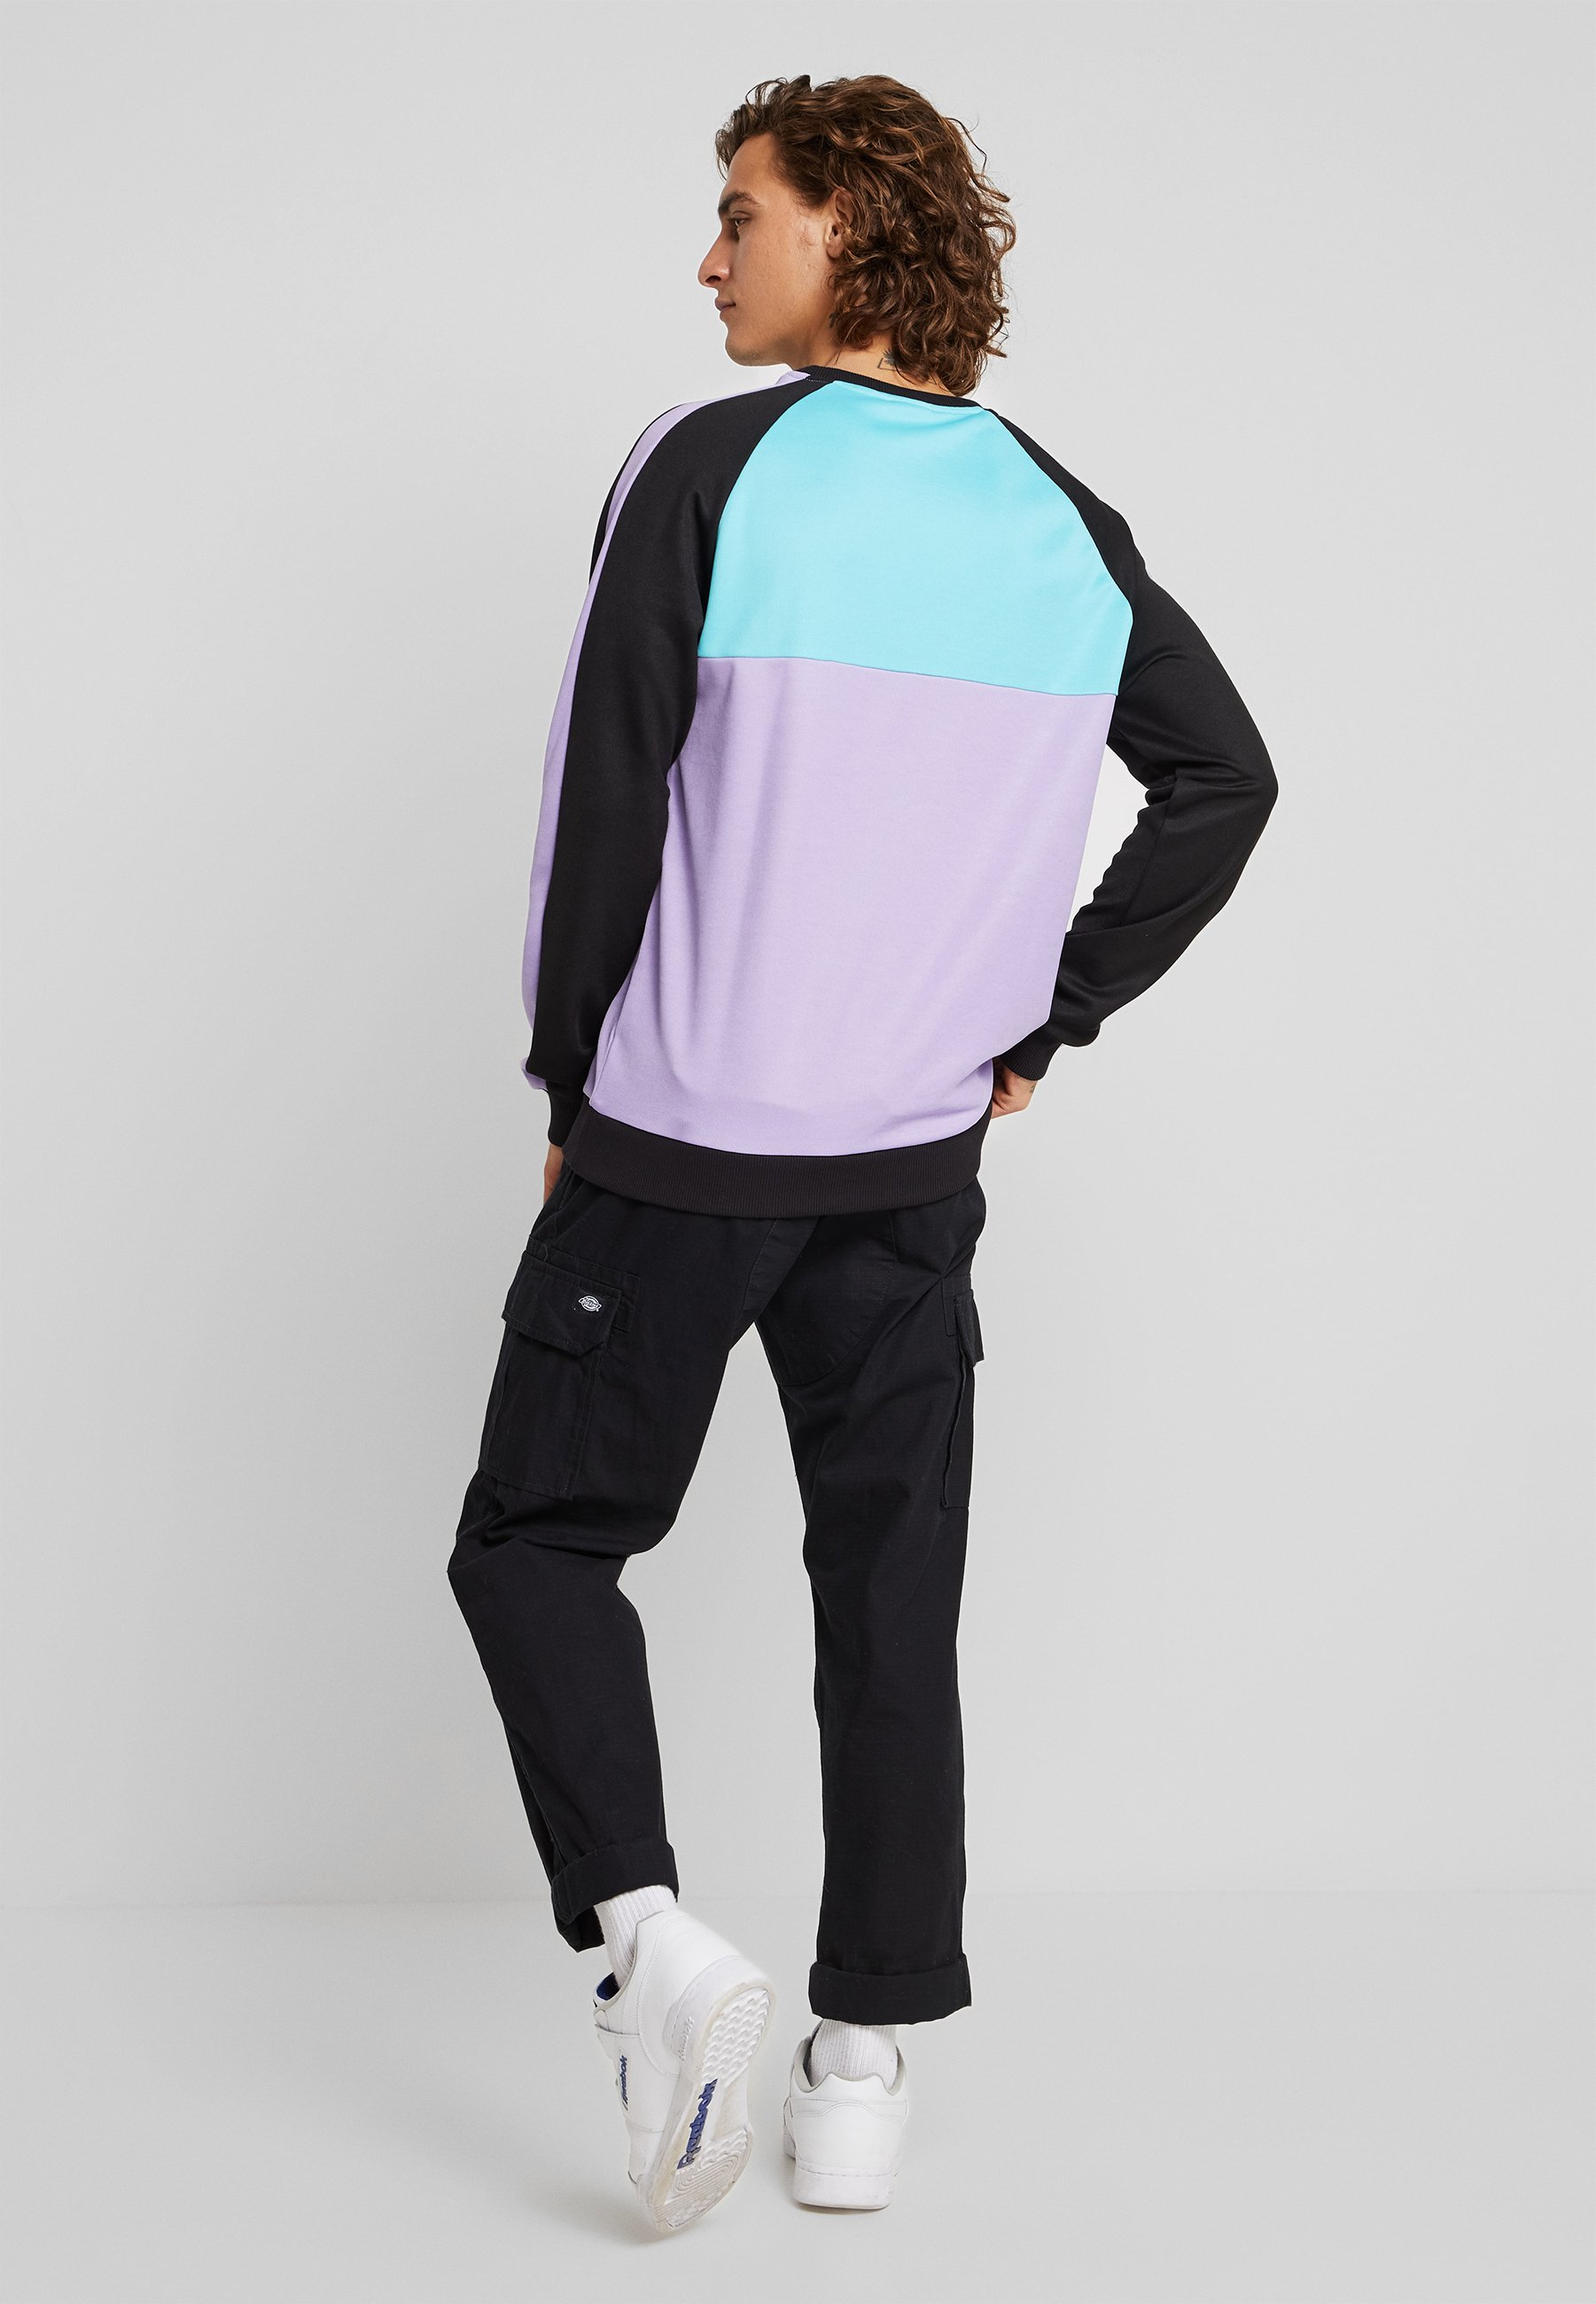 bright CrewSweatshirt Black Tulip violet Curacao Kail Fila blue White Qthsdr